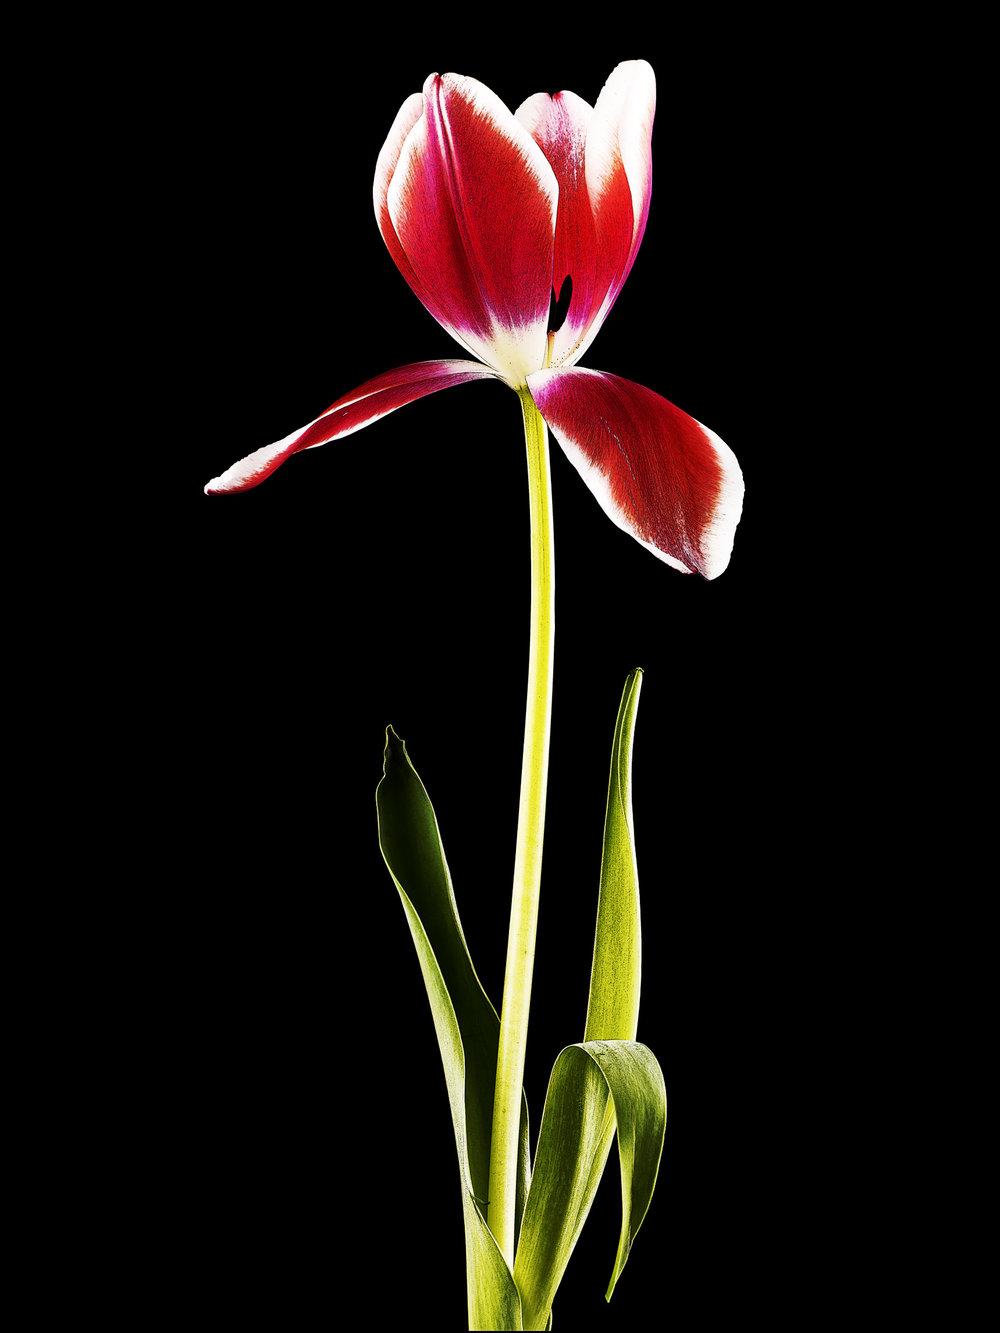 Tulip-4.jpg